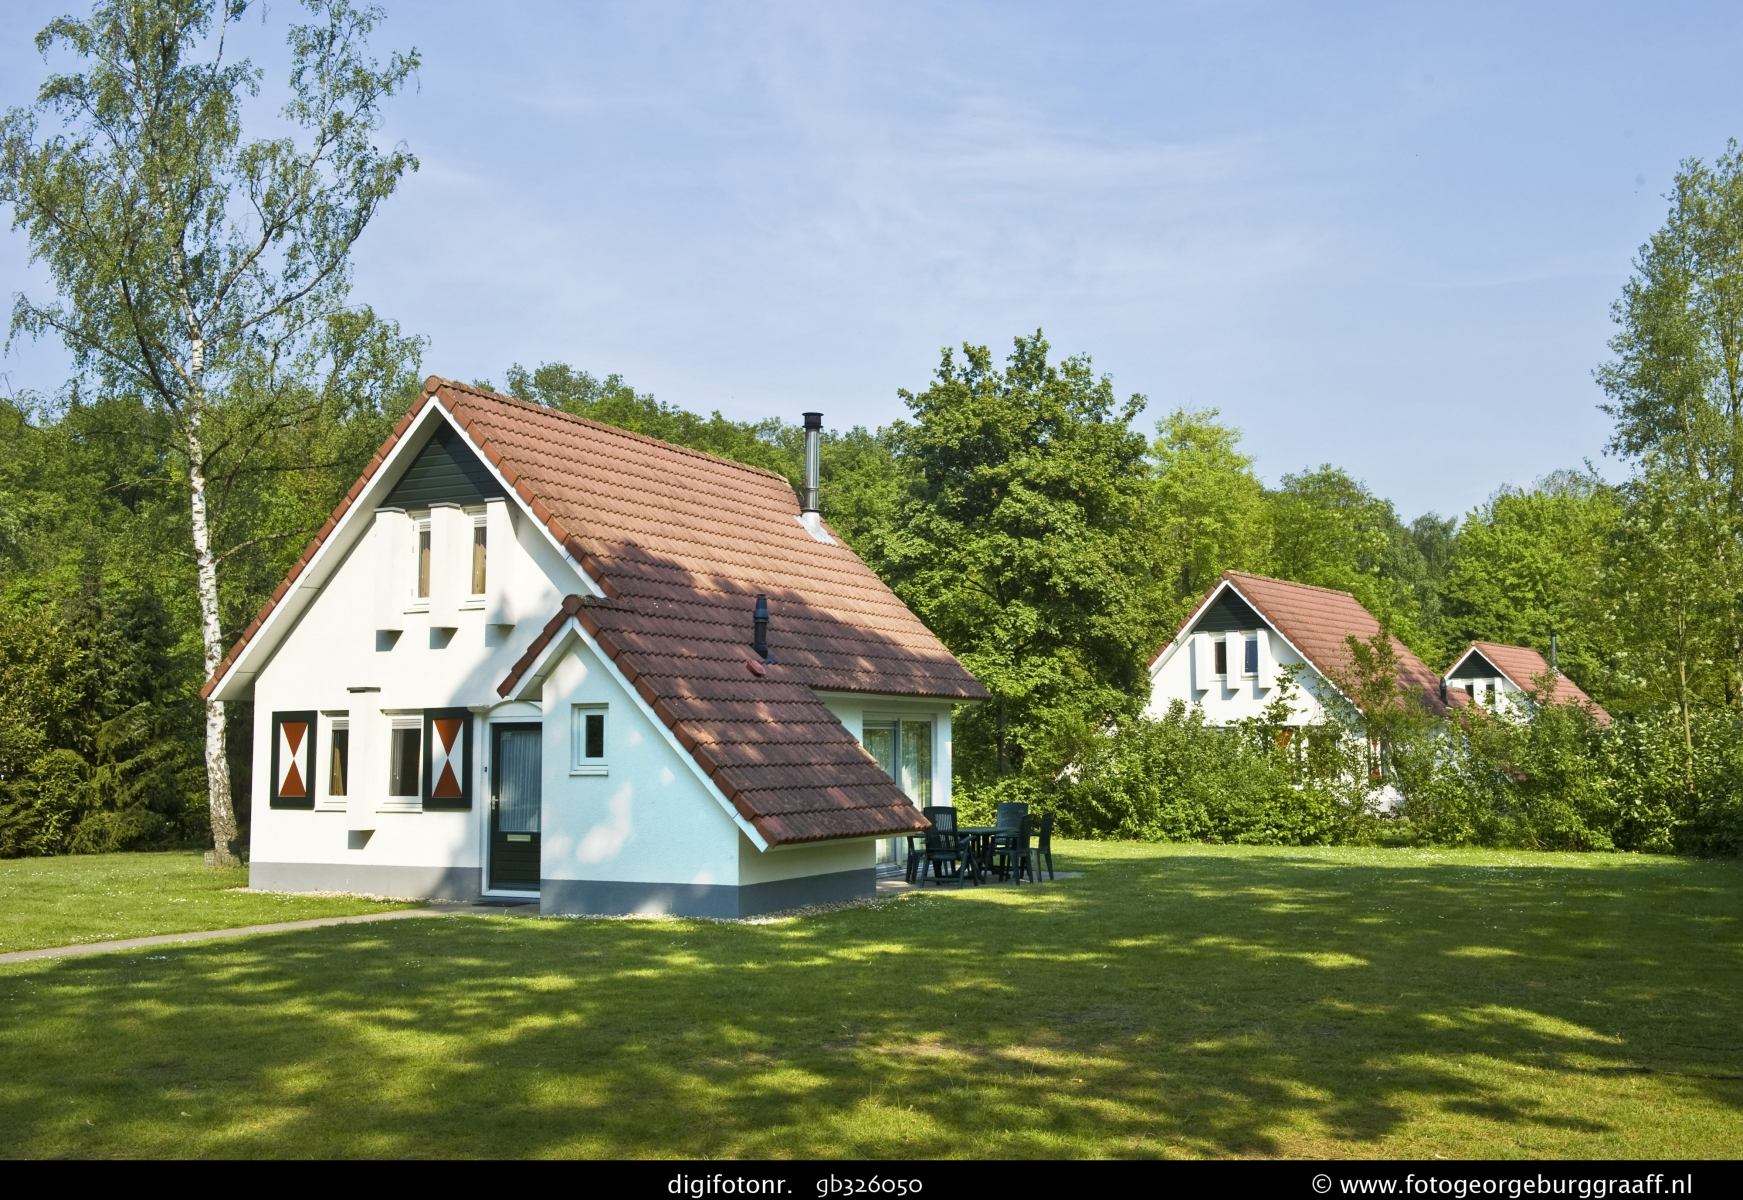 Aanbieding vakantiehuisje Noord Limburg 🏕️Landal Landgoed Aerwinkel